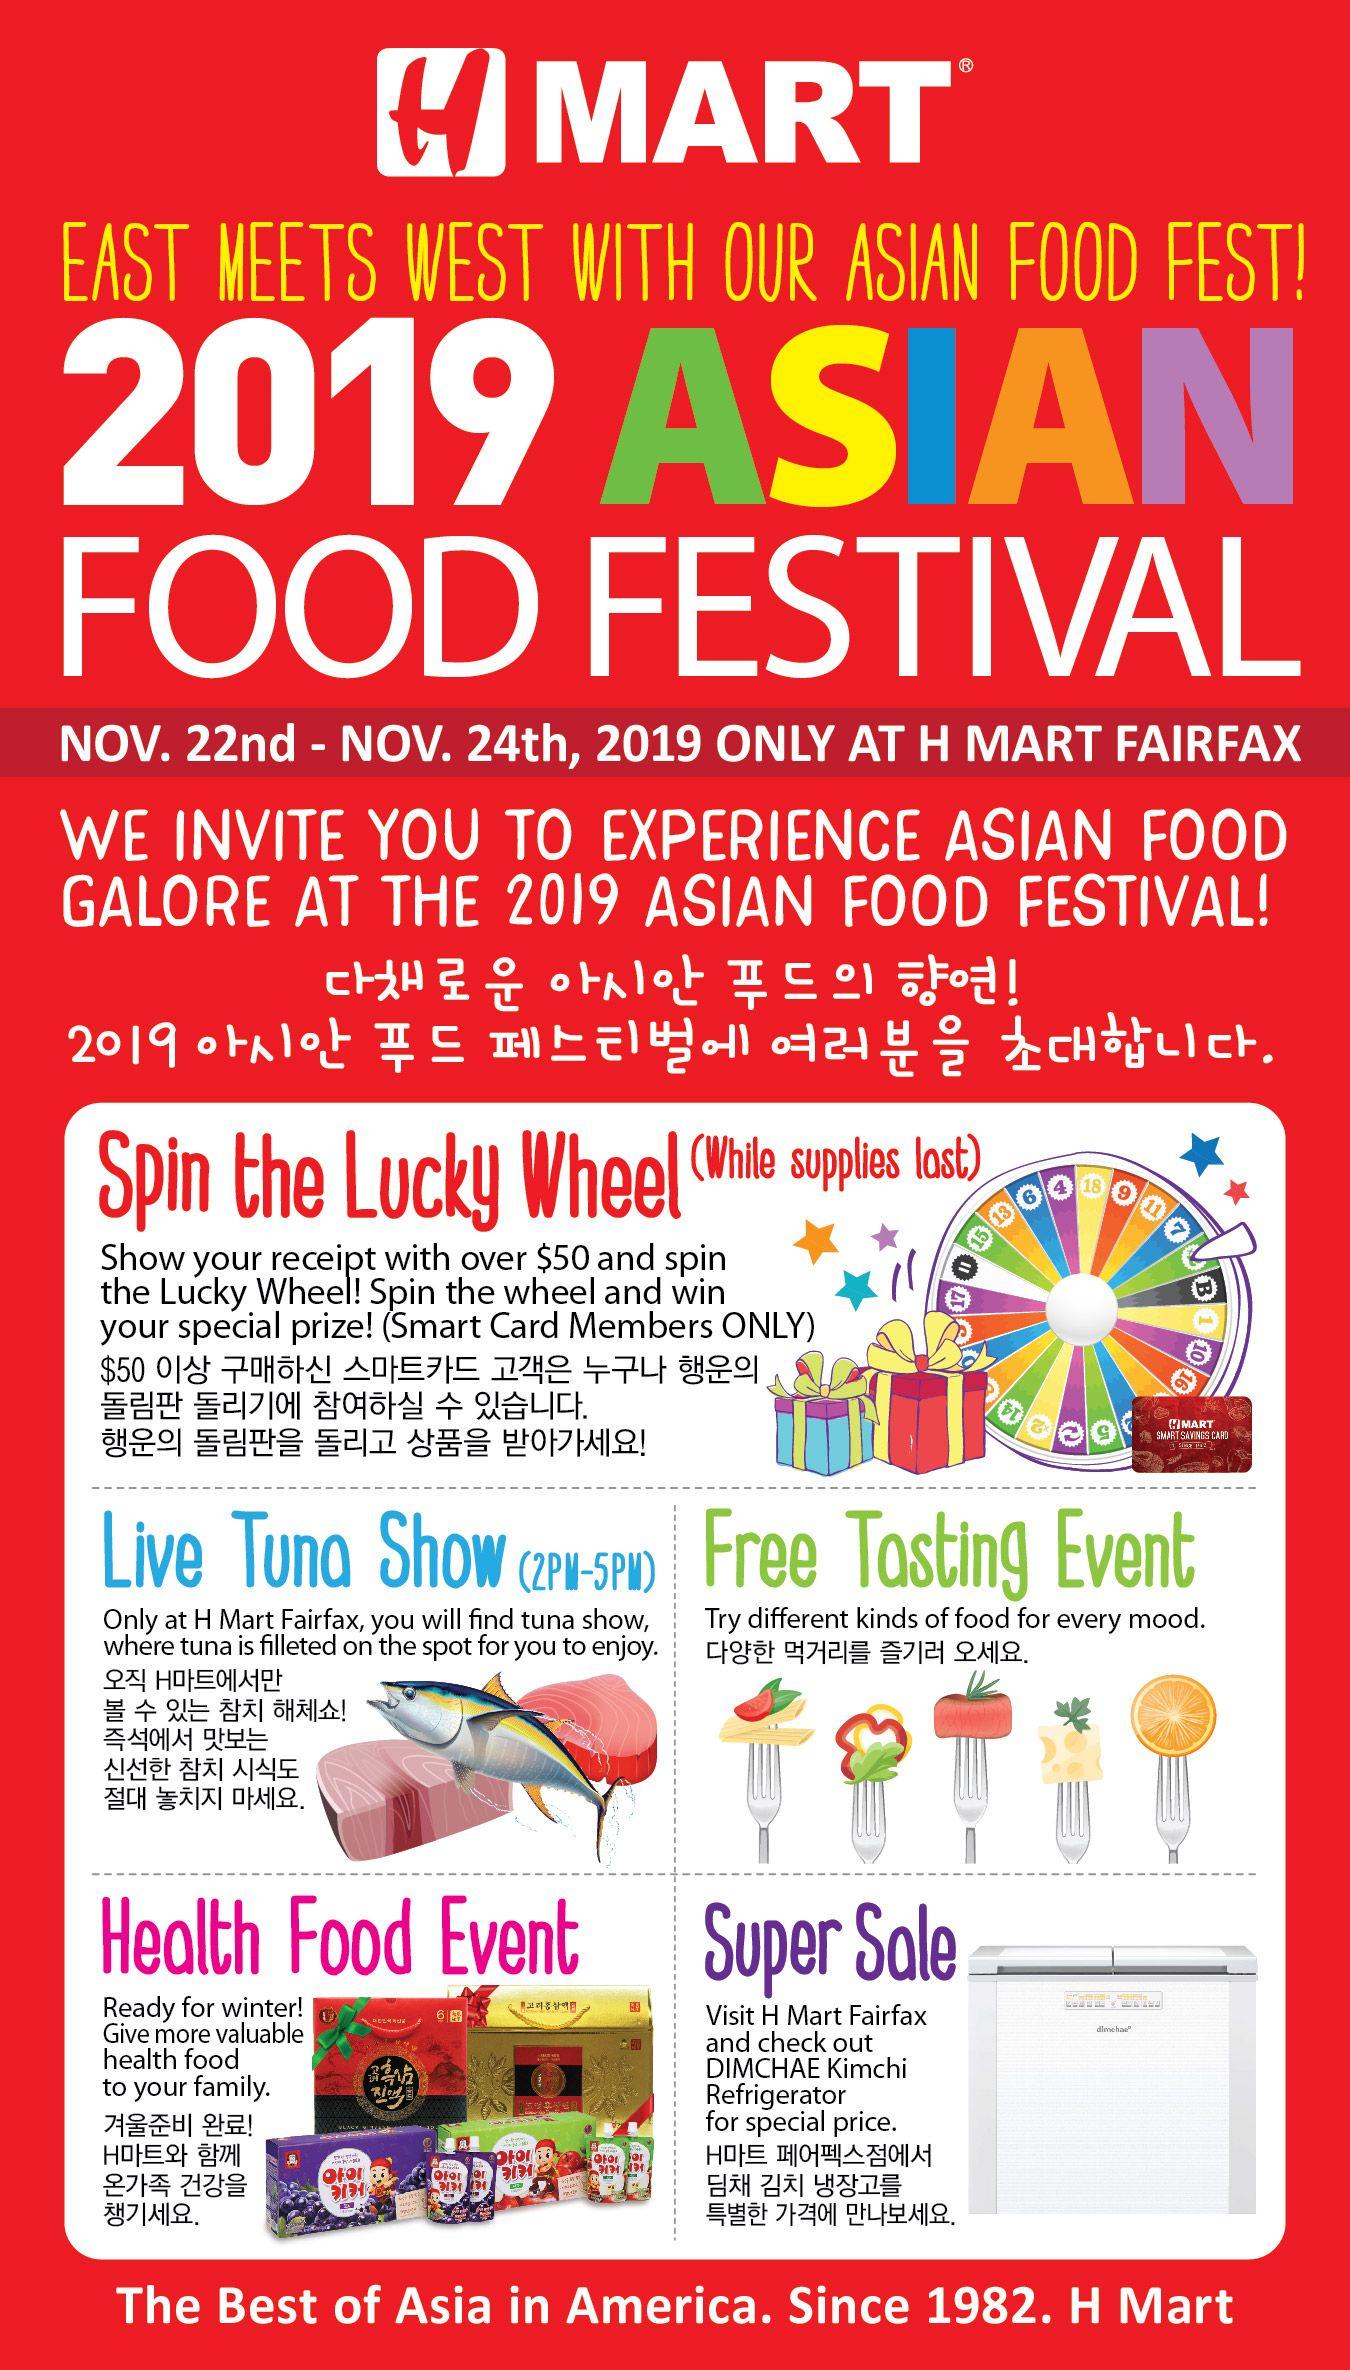 2019_fairfax_asian food festival_%EC%95%84%EC%8B%9C%EC%95%88%ED%91%B8%EB%93%9C%ED%8E%98%EC%8A%A4%ED%8B%B0%EB%B2%8C_poster 01